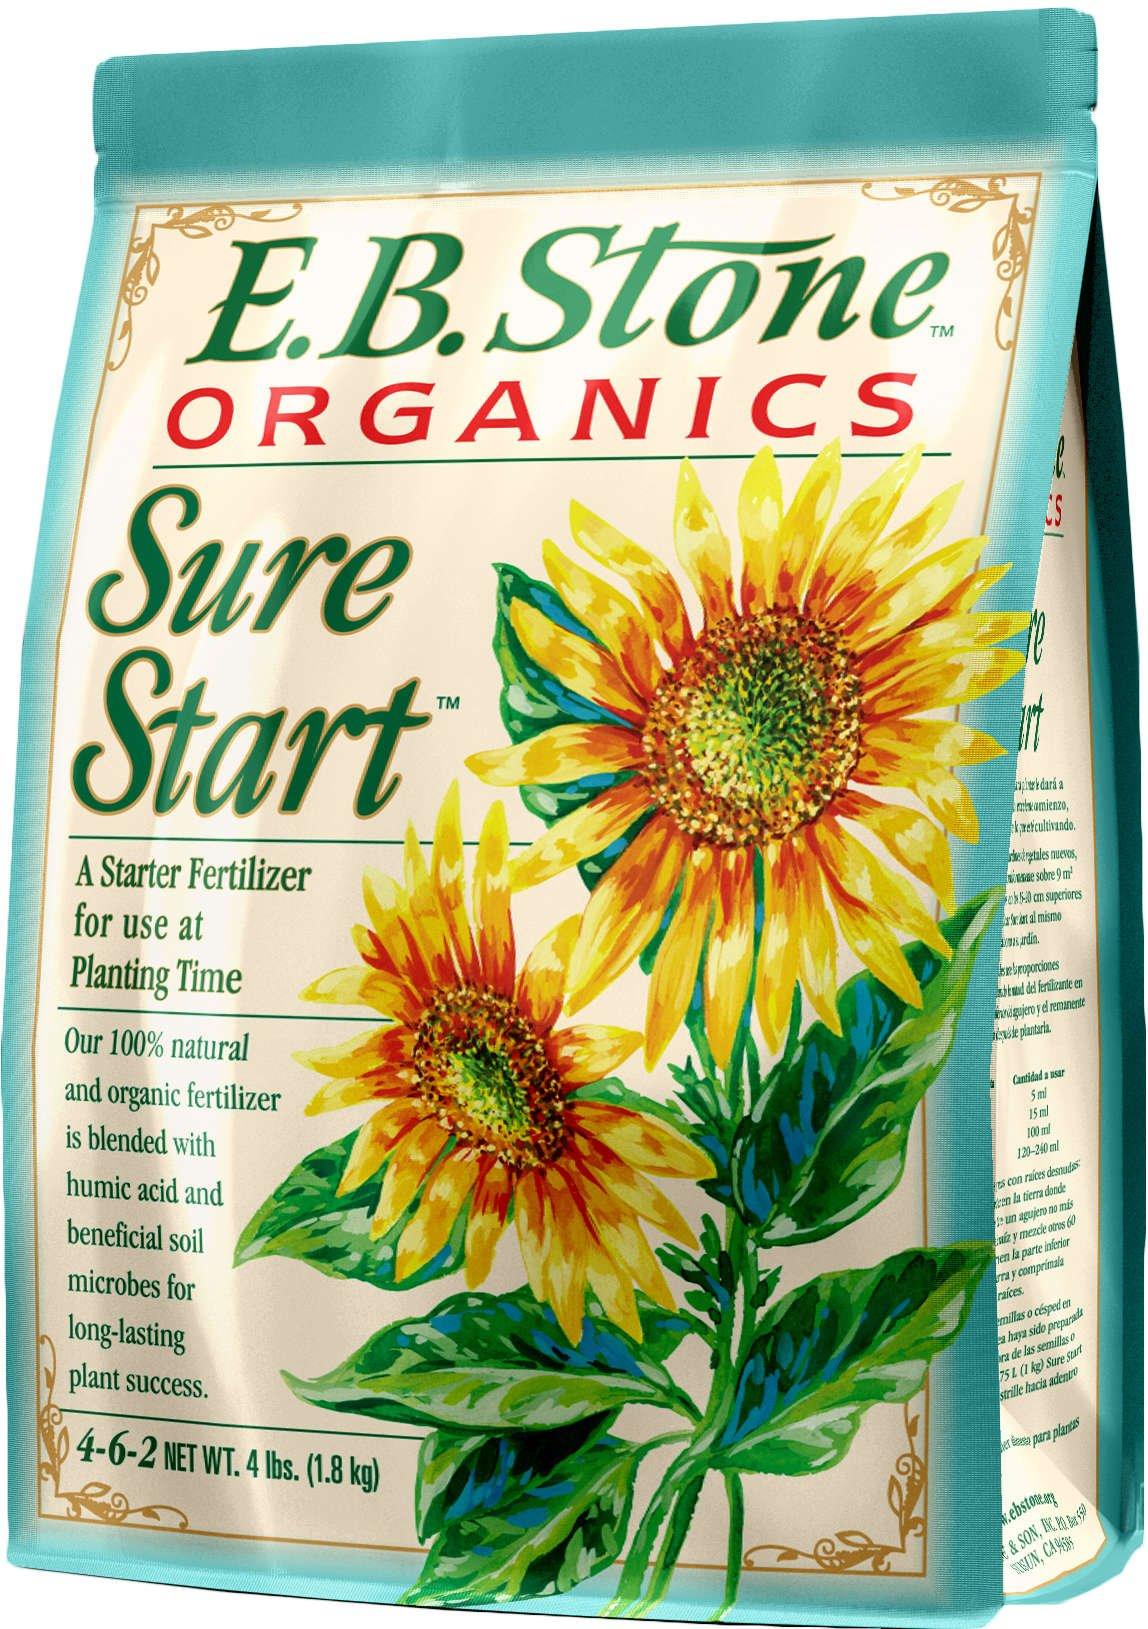 E.B. Stone Organics Sure Start